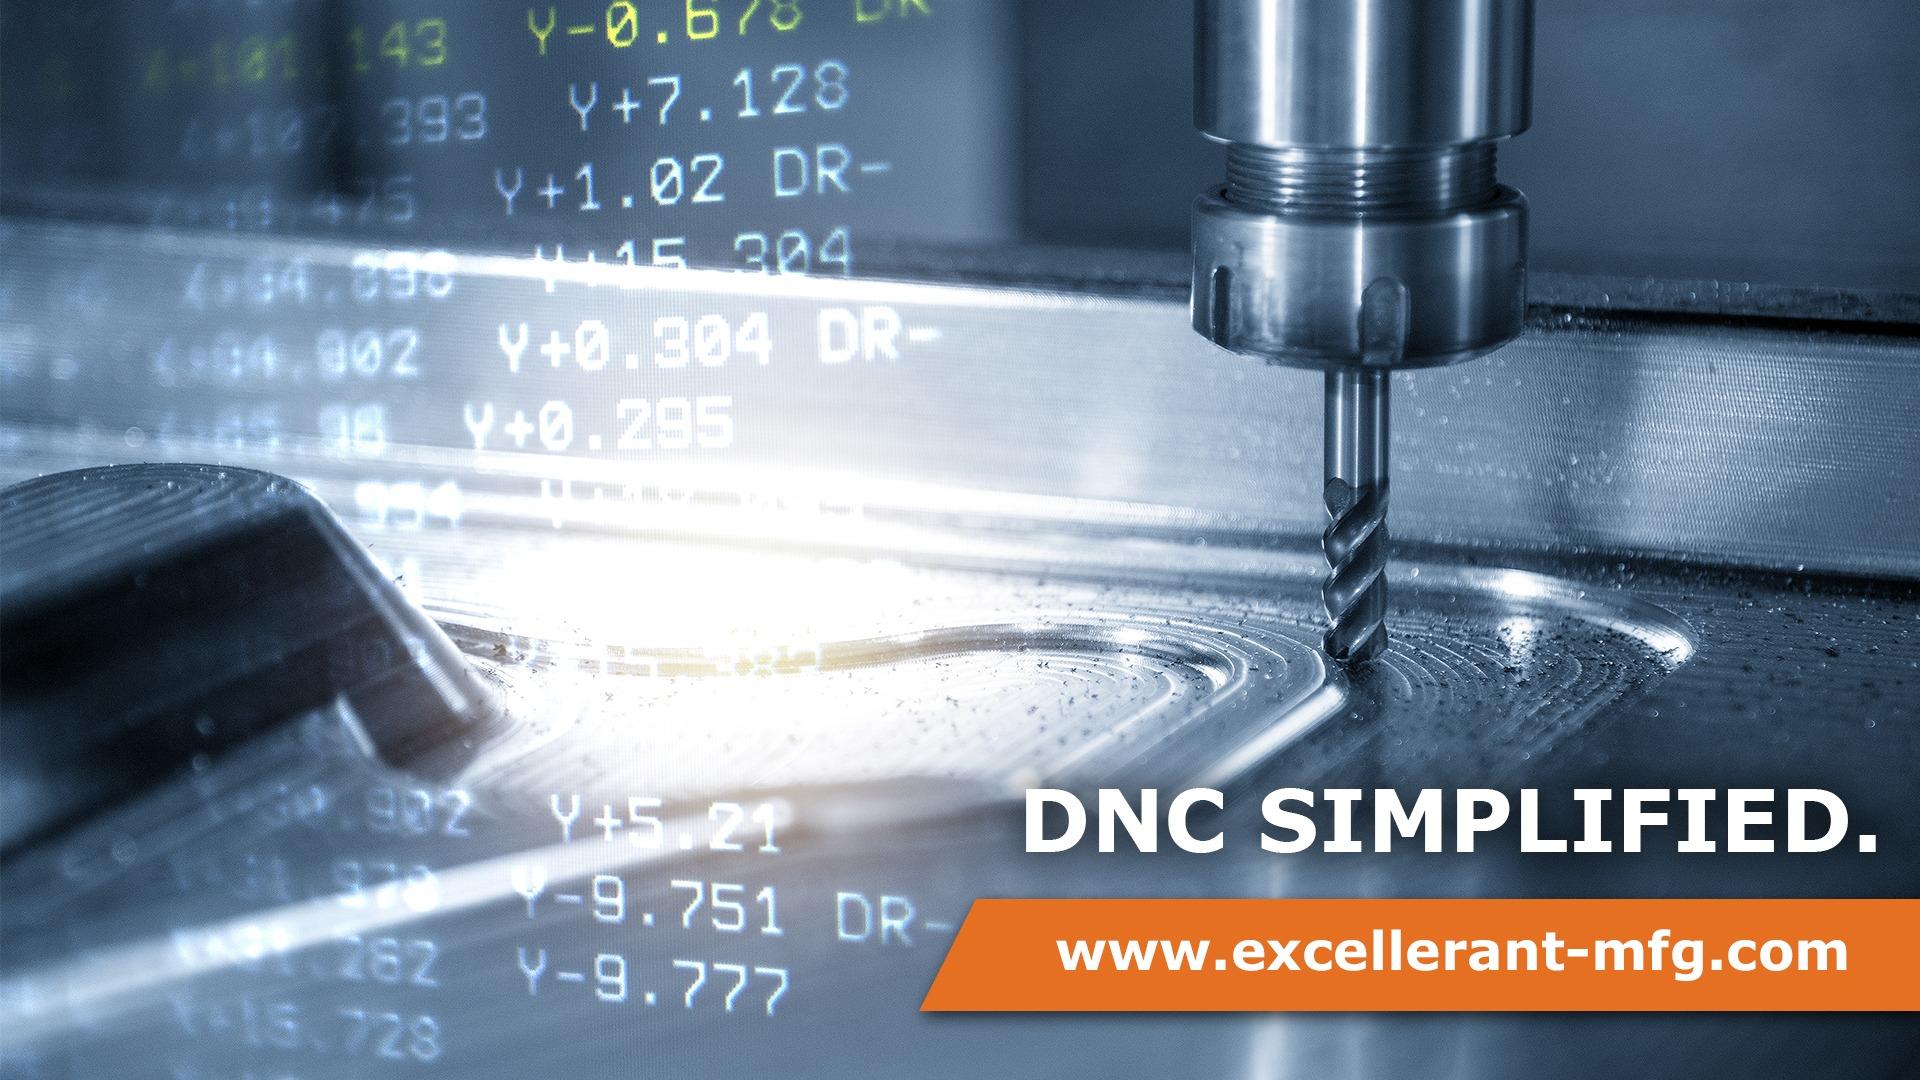 Excellerant - DNC Simplified.